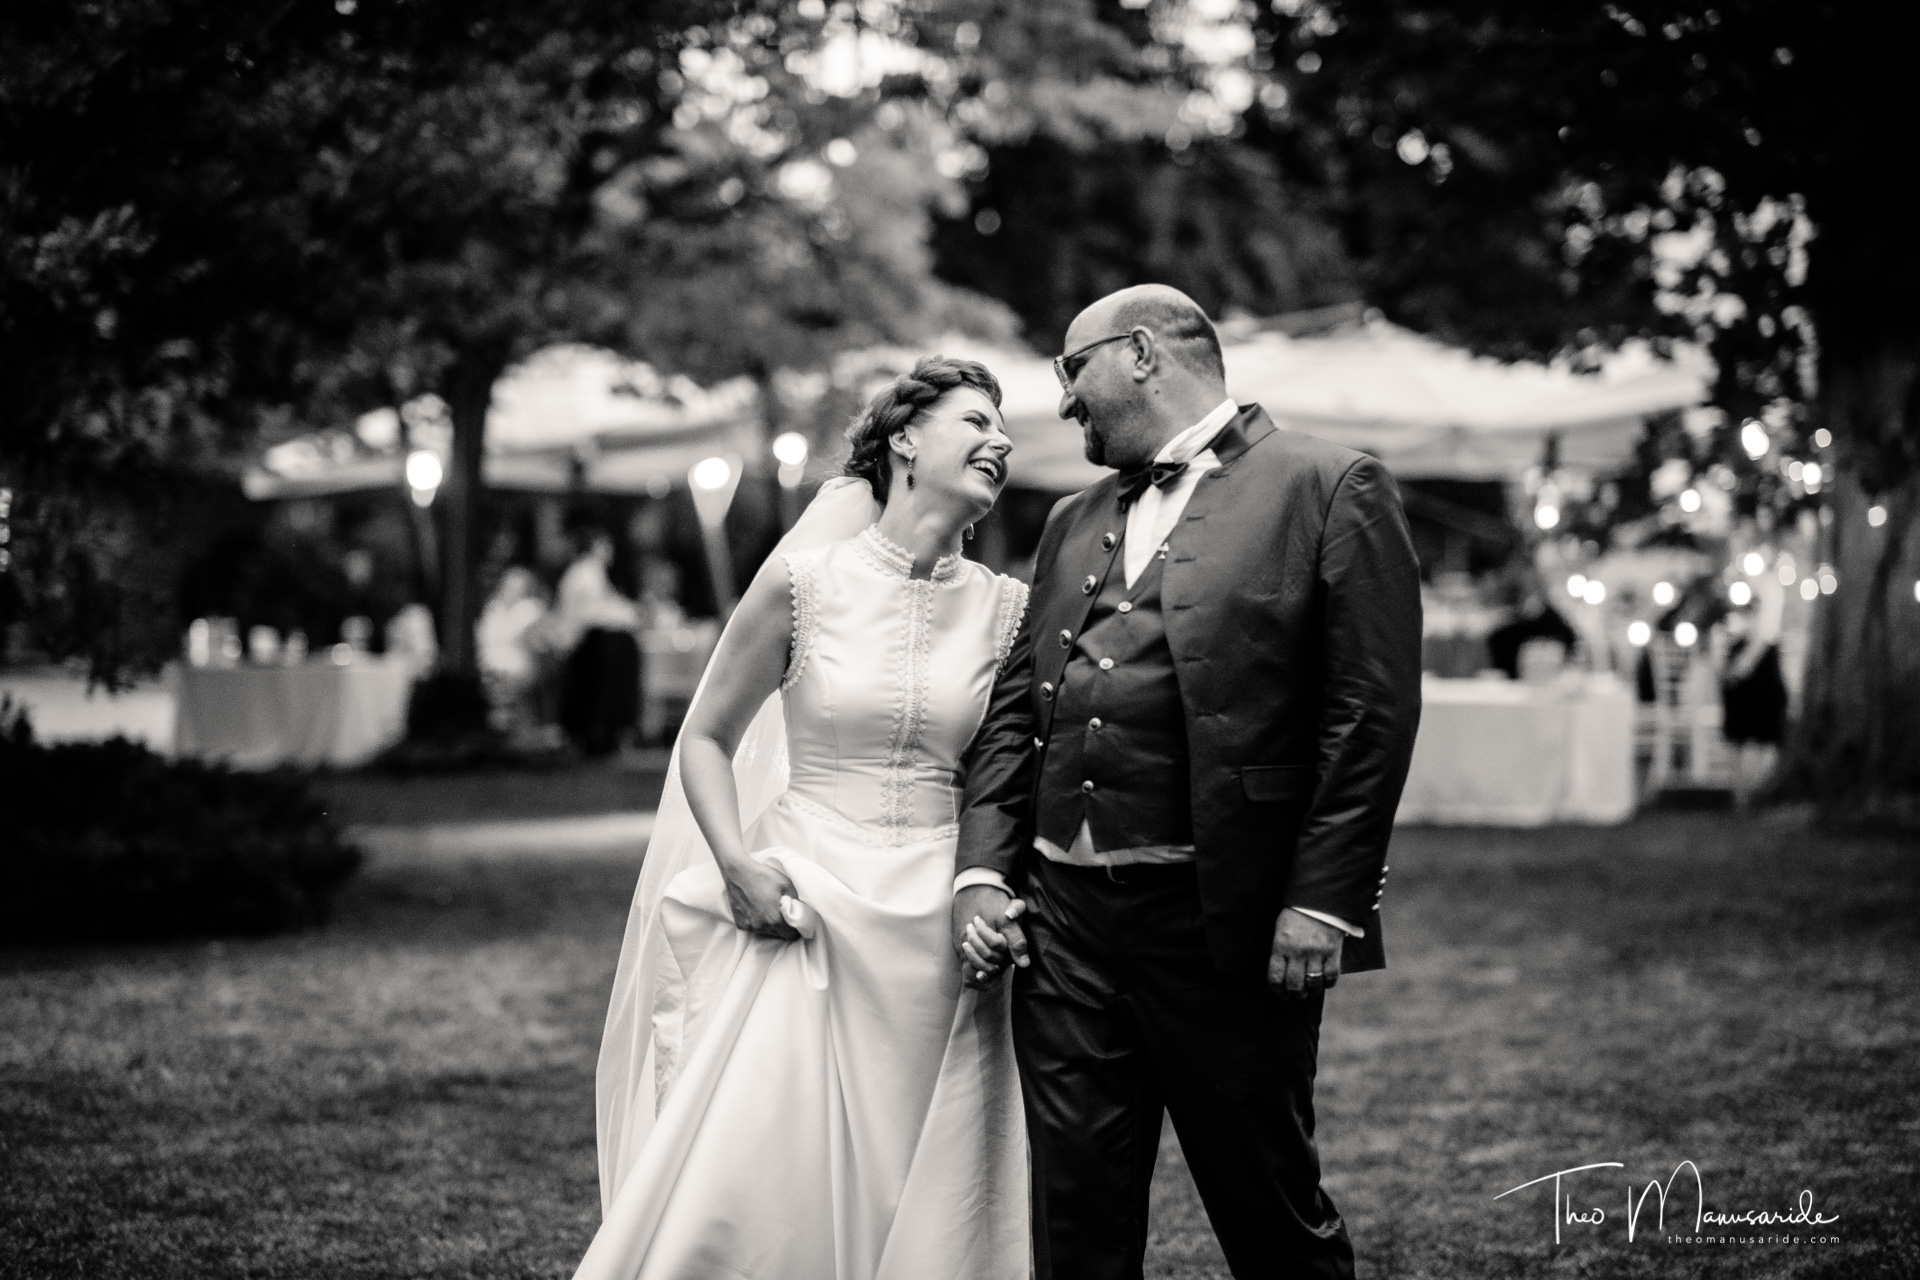 fotograf-nunta-domeniul-manasia-39